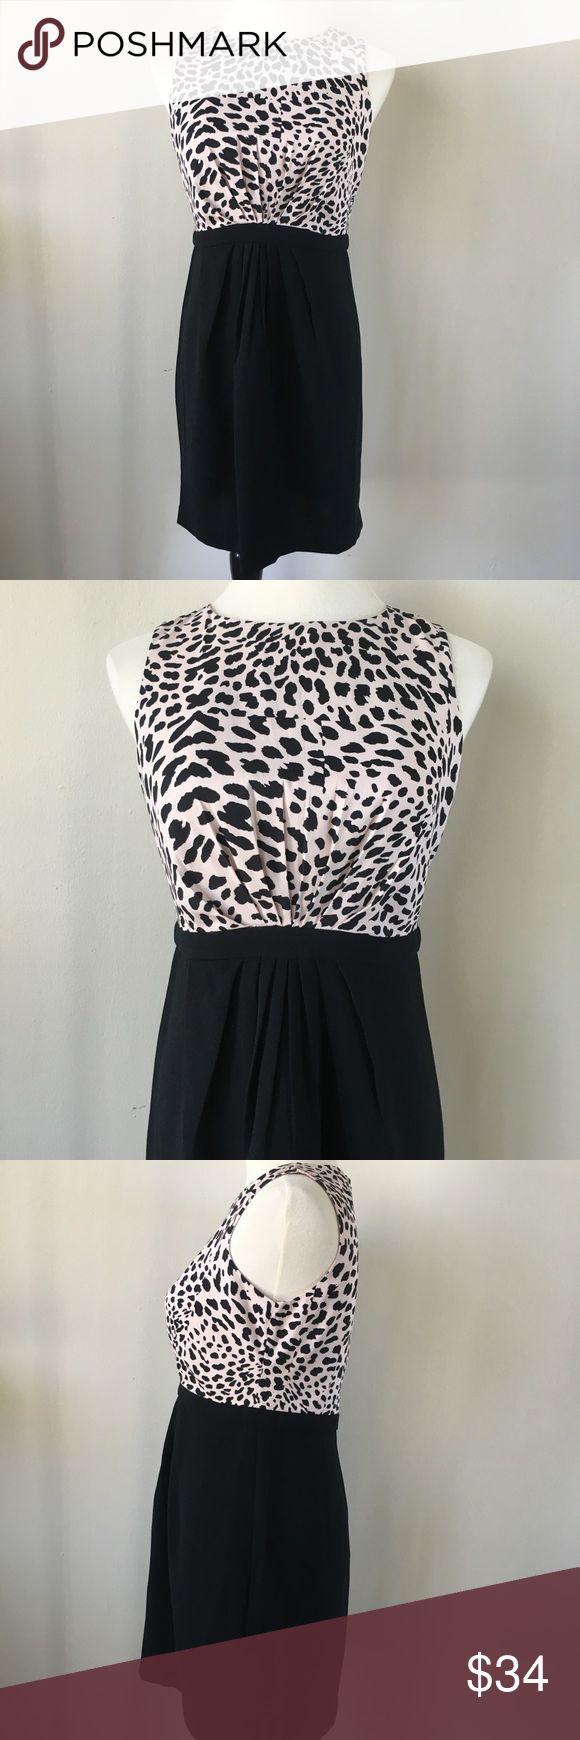 Ann Taylor Loft Animal Print Work Dress pink animal print upper with black skirt //sleeveless // wear to work sheath dress // hidden back zipper // above knee length // 100% polyester // excellent condition LOFT Dresses